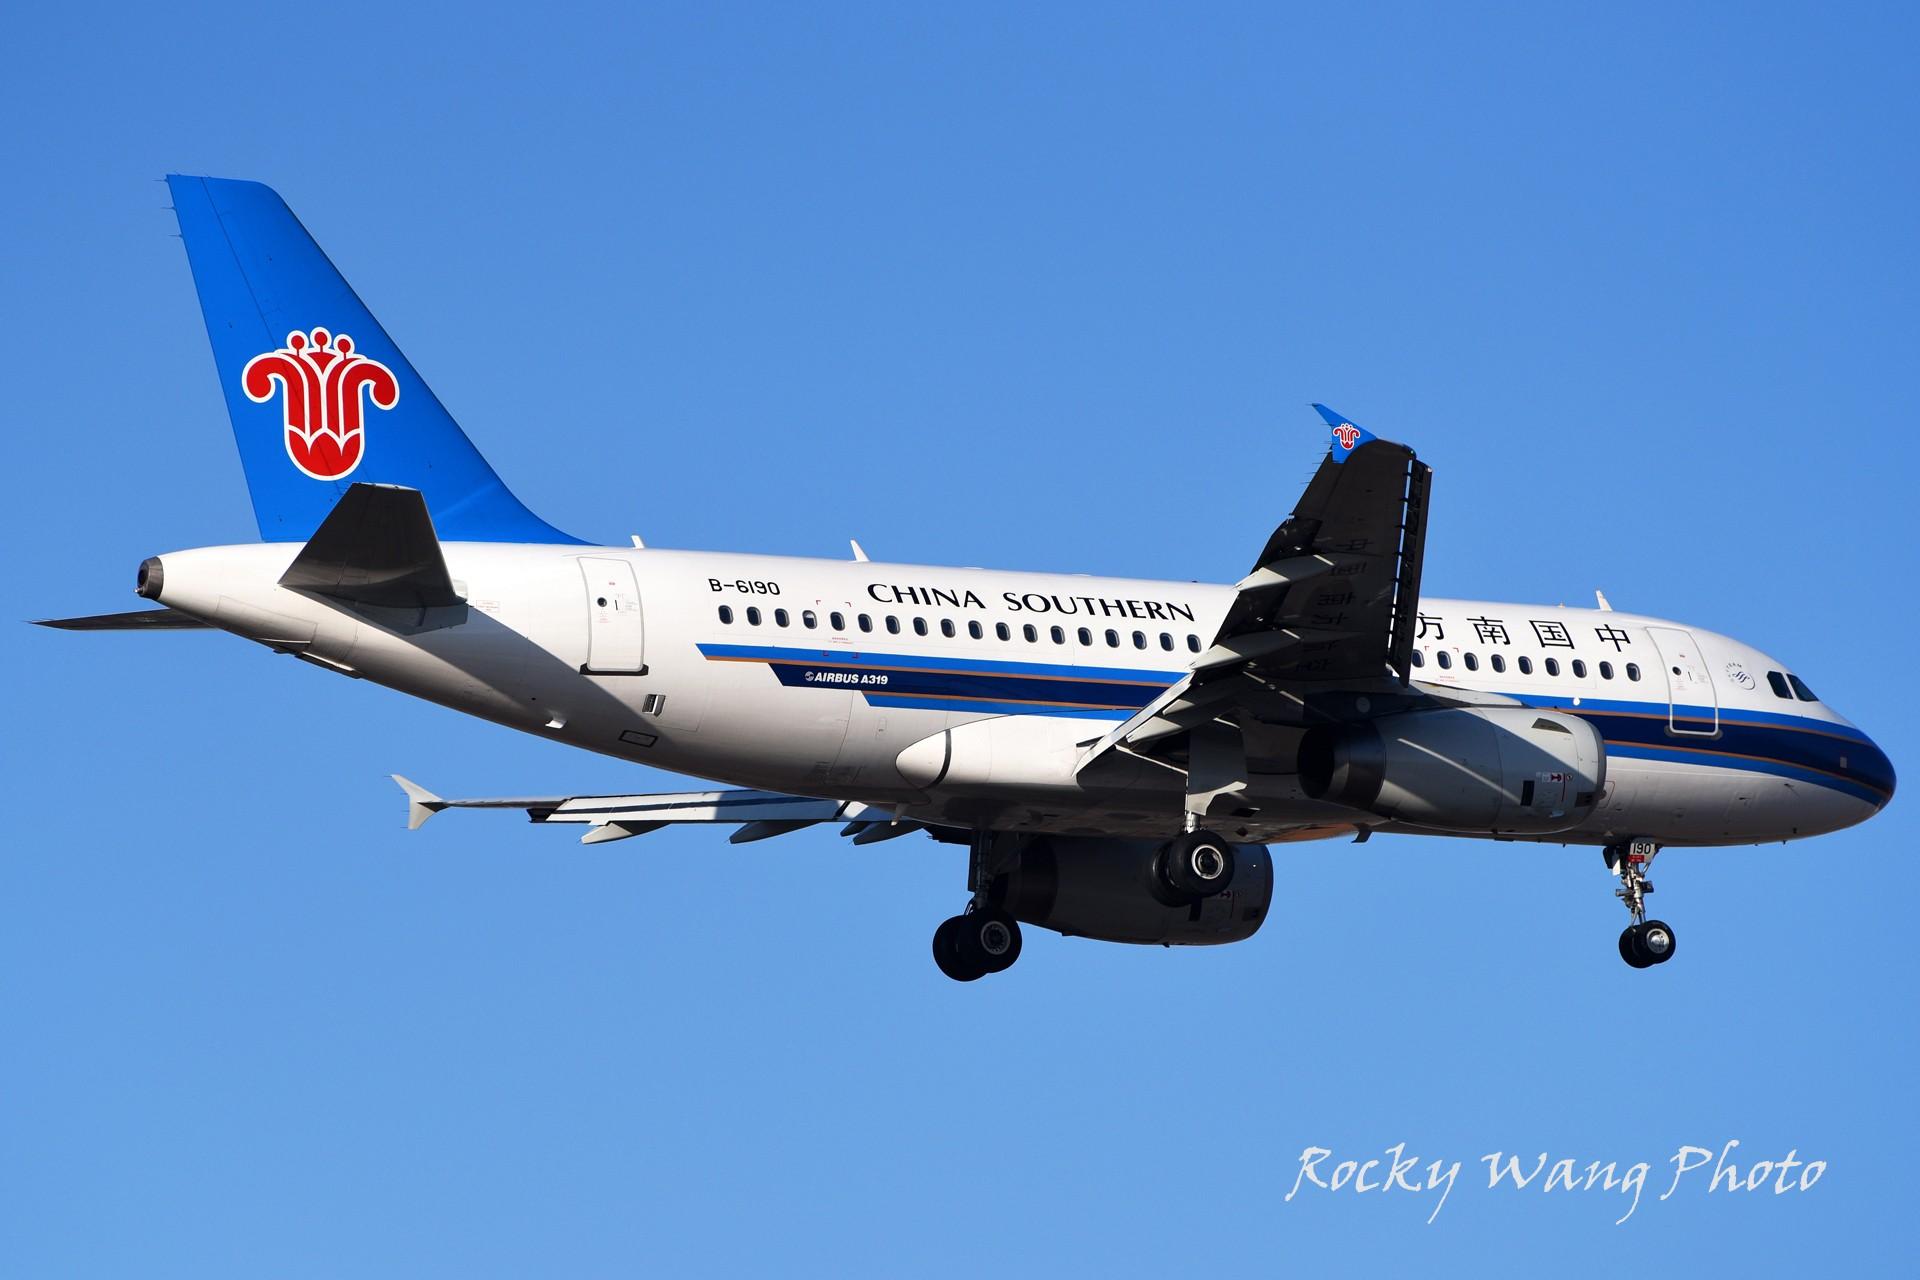 Re:[原创]杂图20张 AIRBUS A319-100 B-6190 中国北京首都国际机场